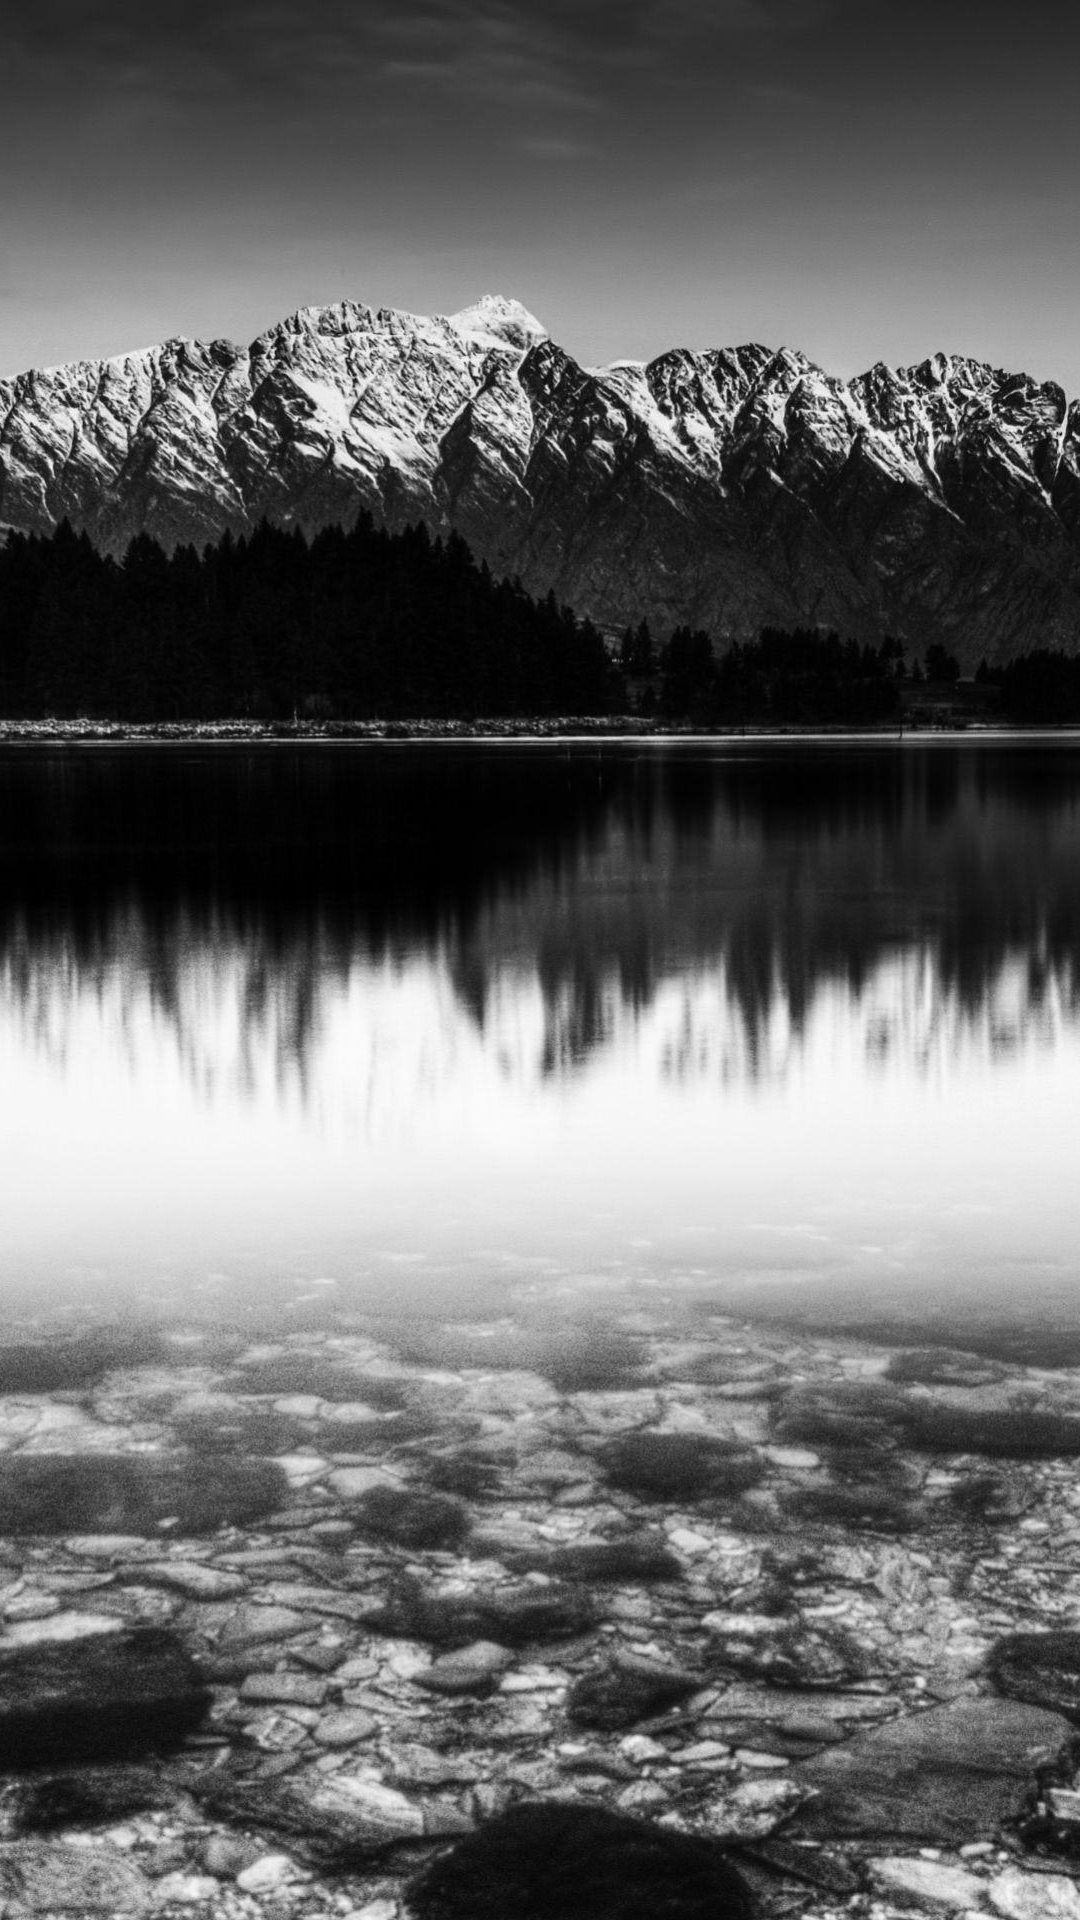 Black And White Snow Mountain Lake Iphone 6 Plus Hd Wallpaper Cuteiphonewallpap Black And White Wallpaper Iphone Nature Iphone Wallpaper Iphone Wallpaper Sky